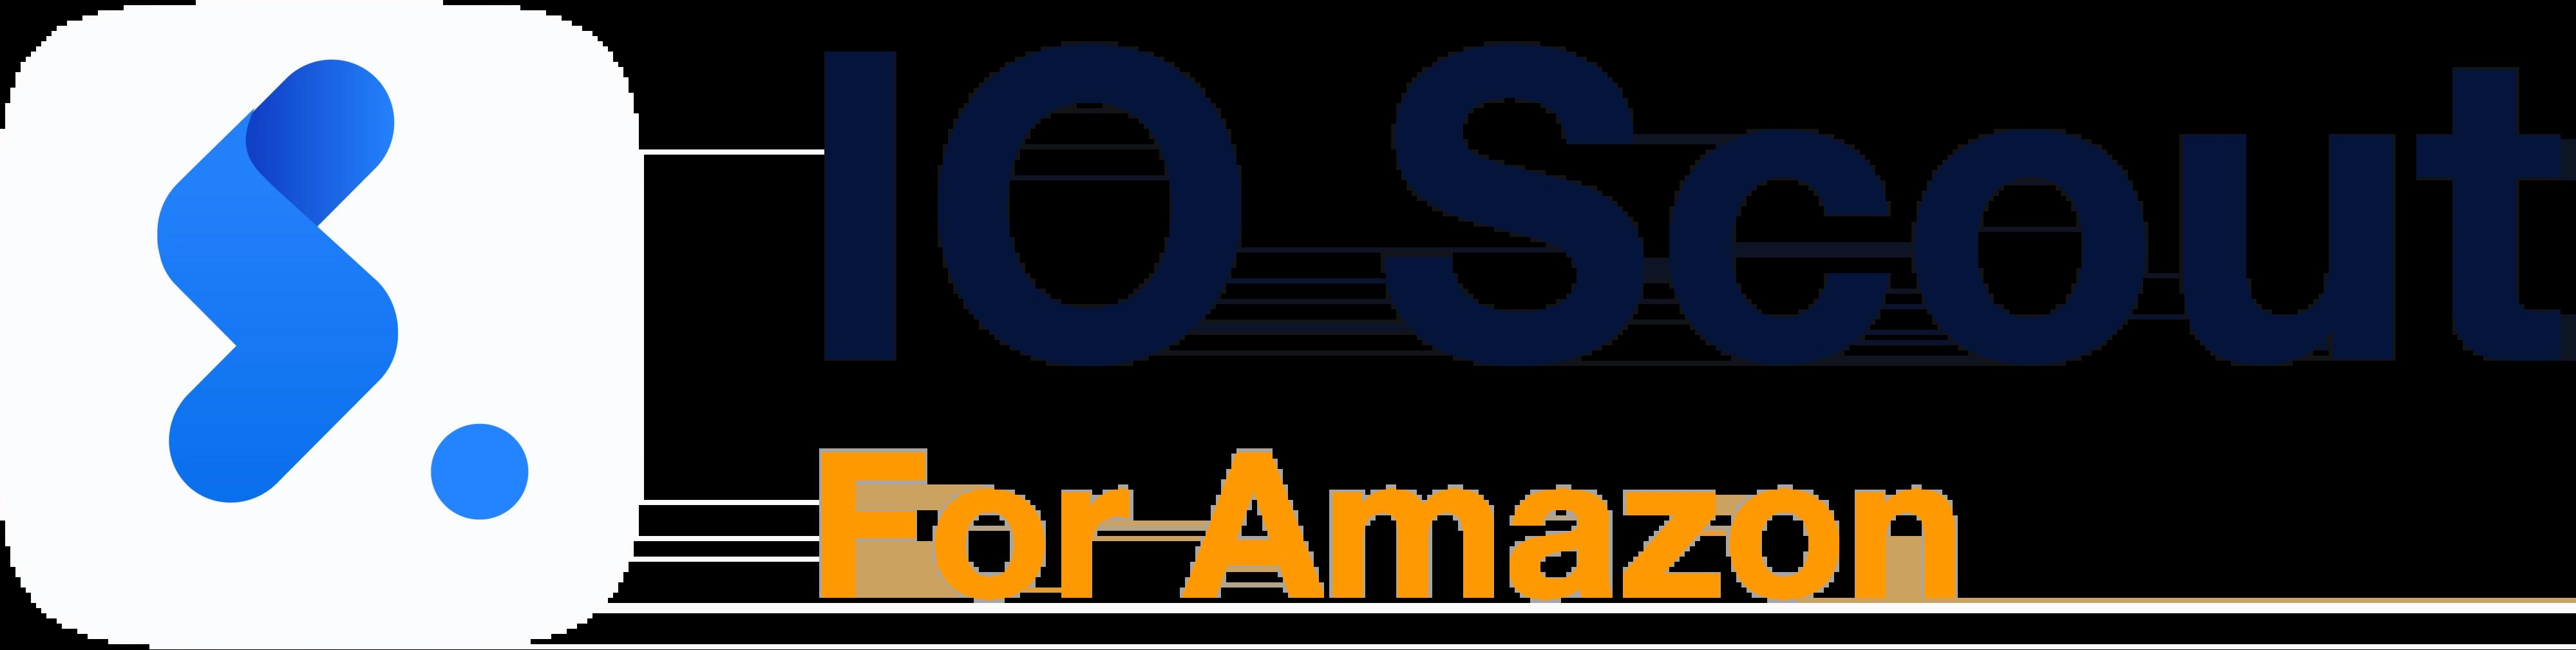 io scout amazon seller tools